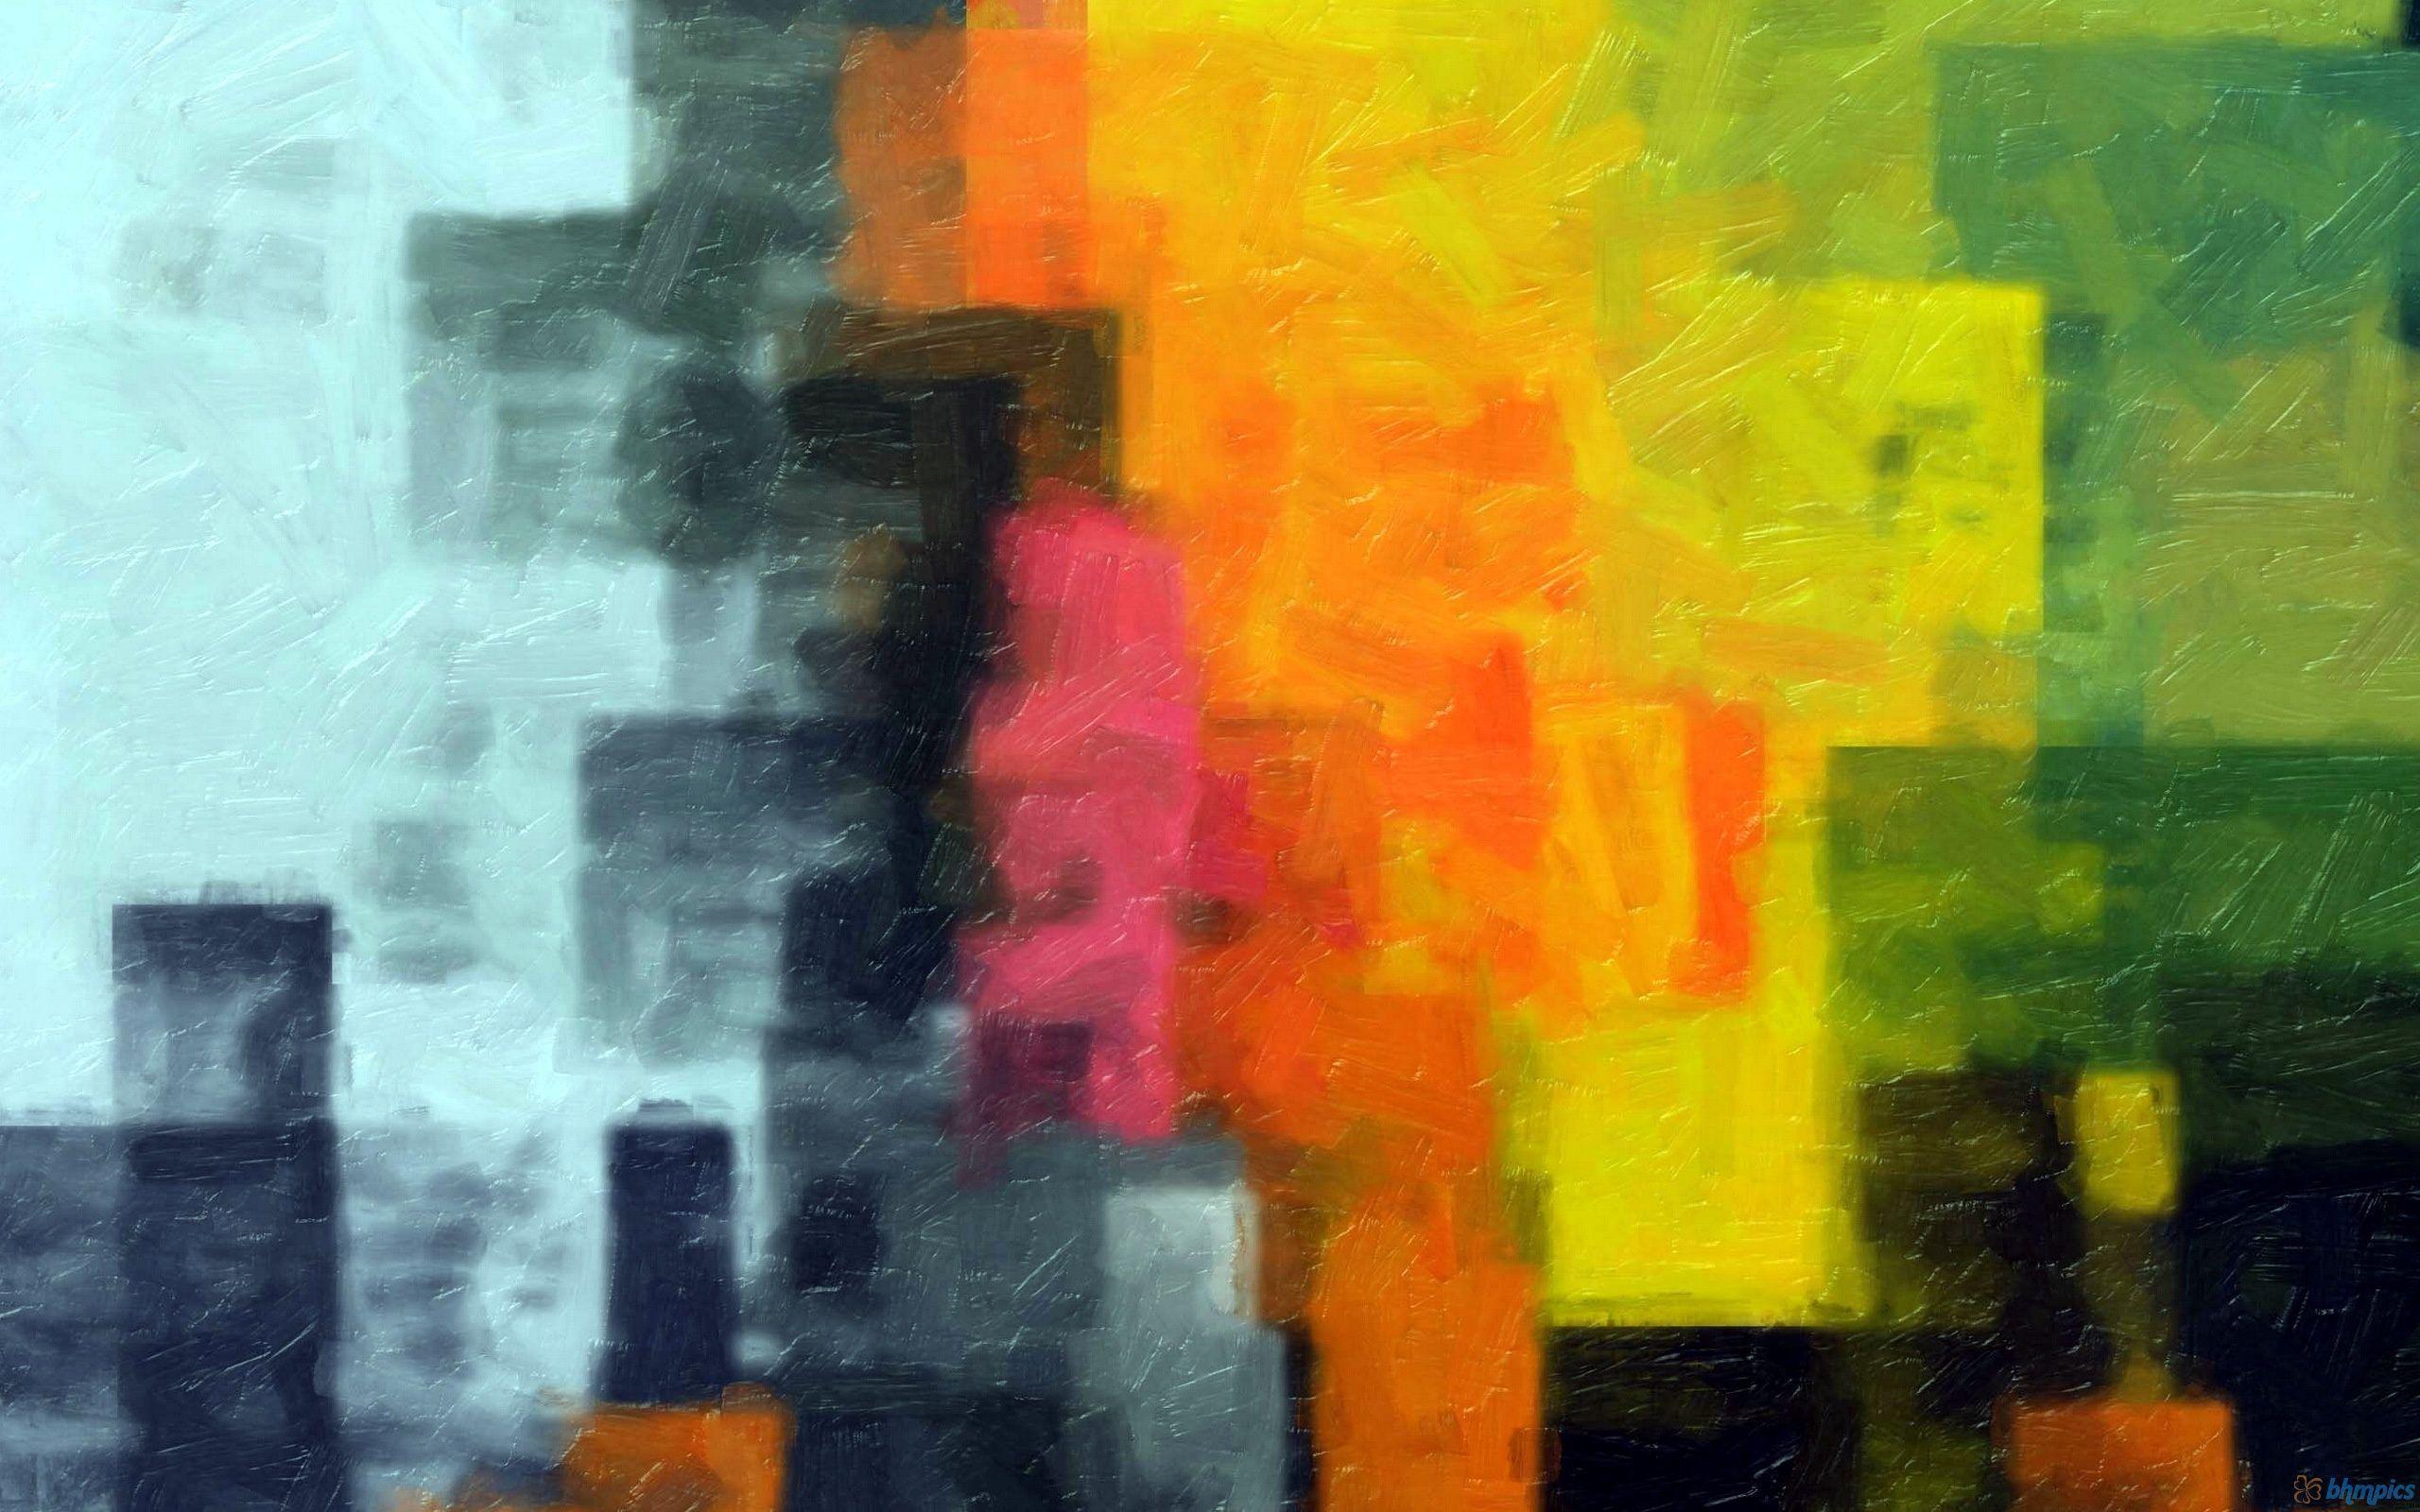 Wallpaper Abstrak 3d Abstract Painting Wallpapers Wallpaper Cave